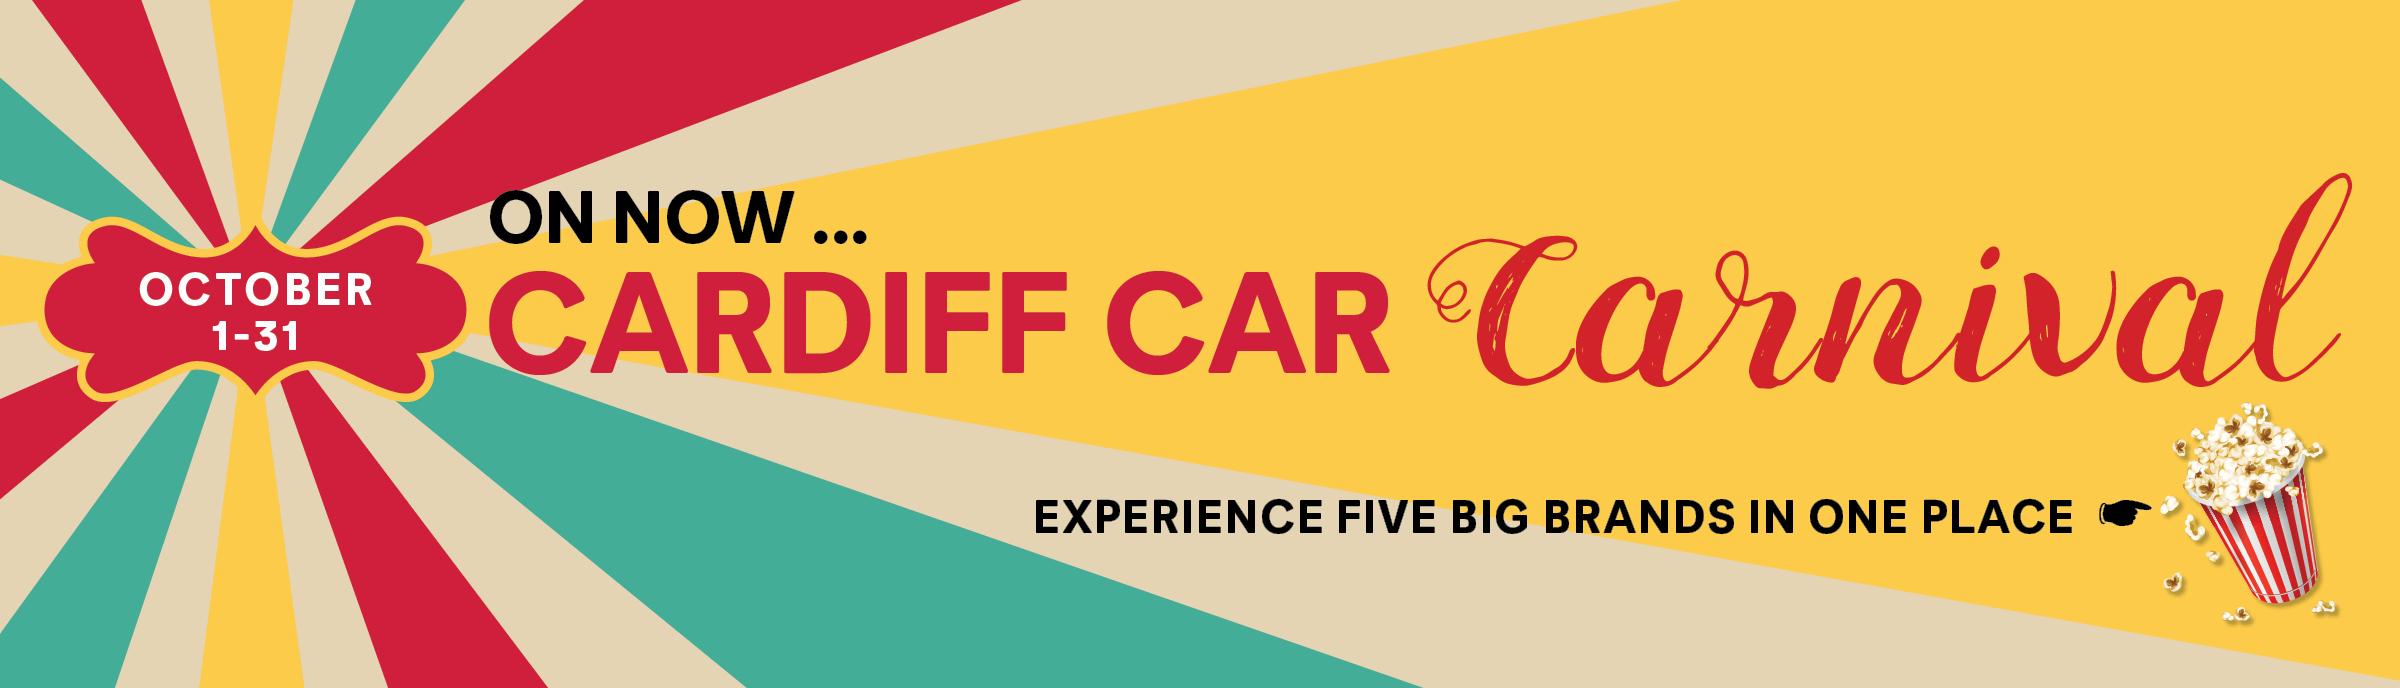 Cardiff Car Carnival